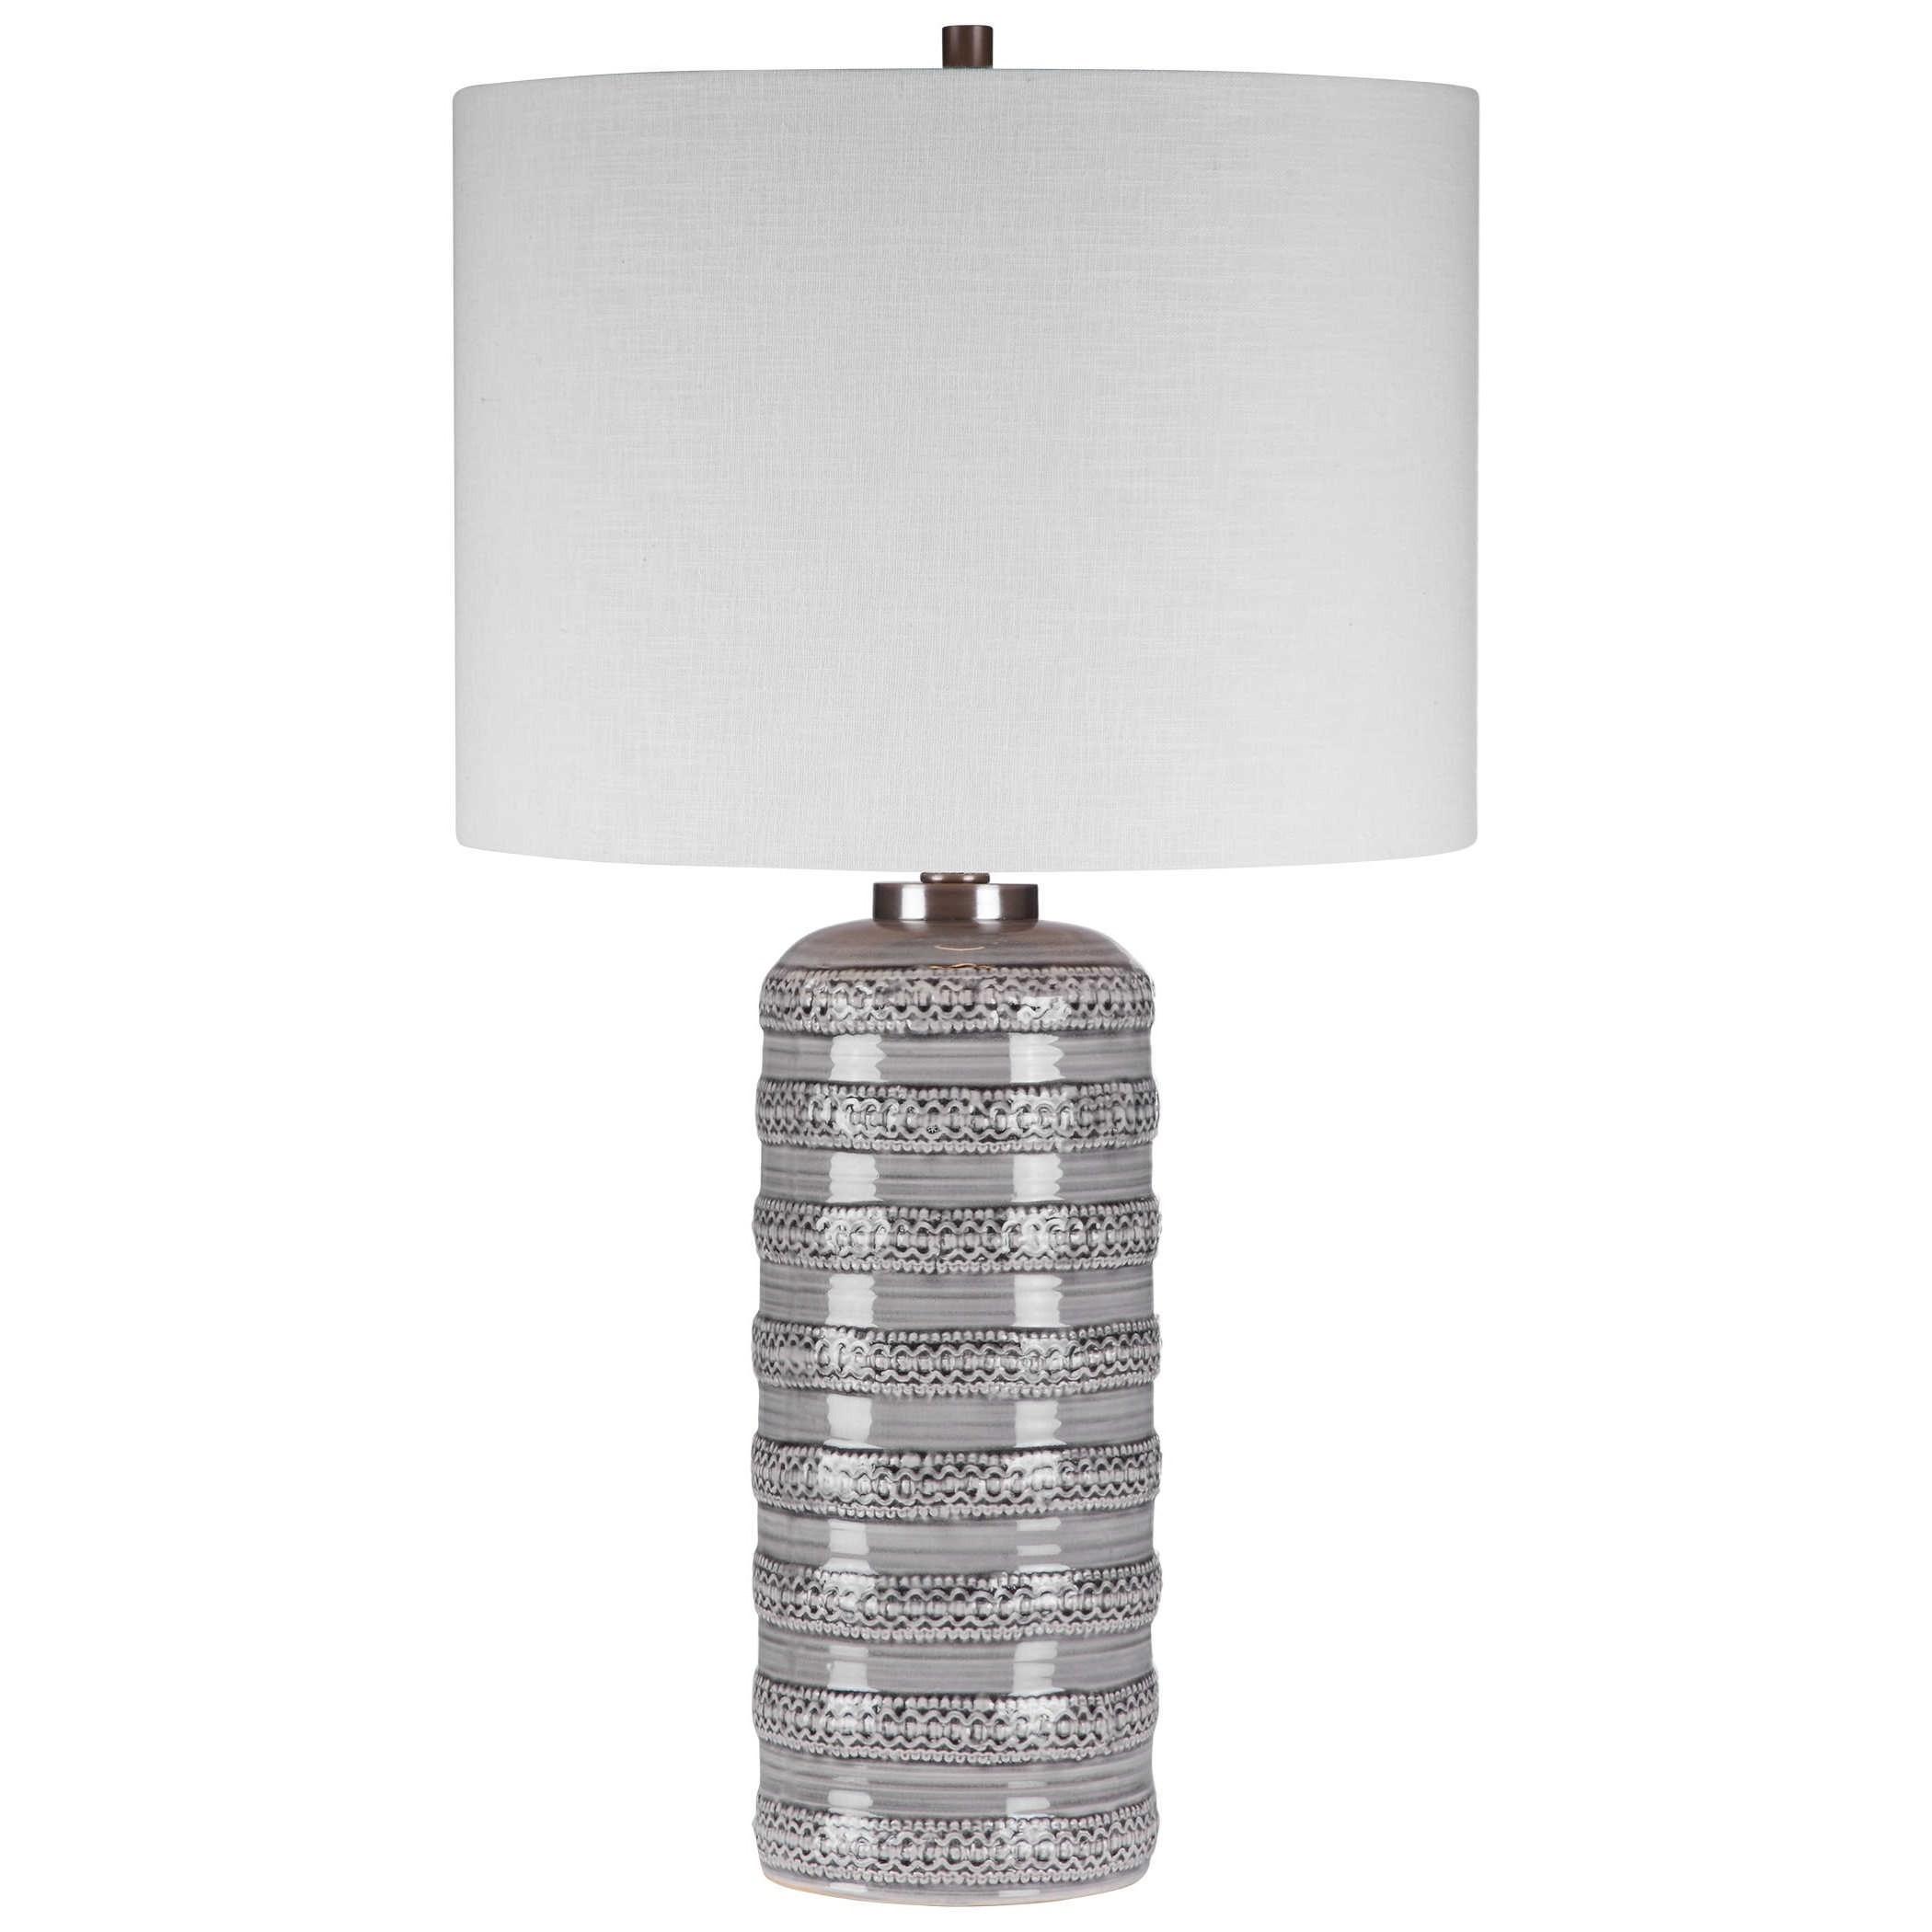 Alenon Light Gray Table Lamp